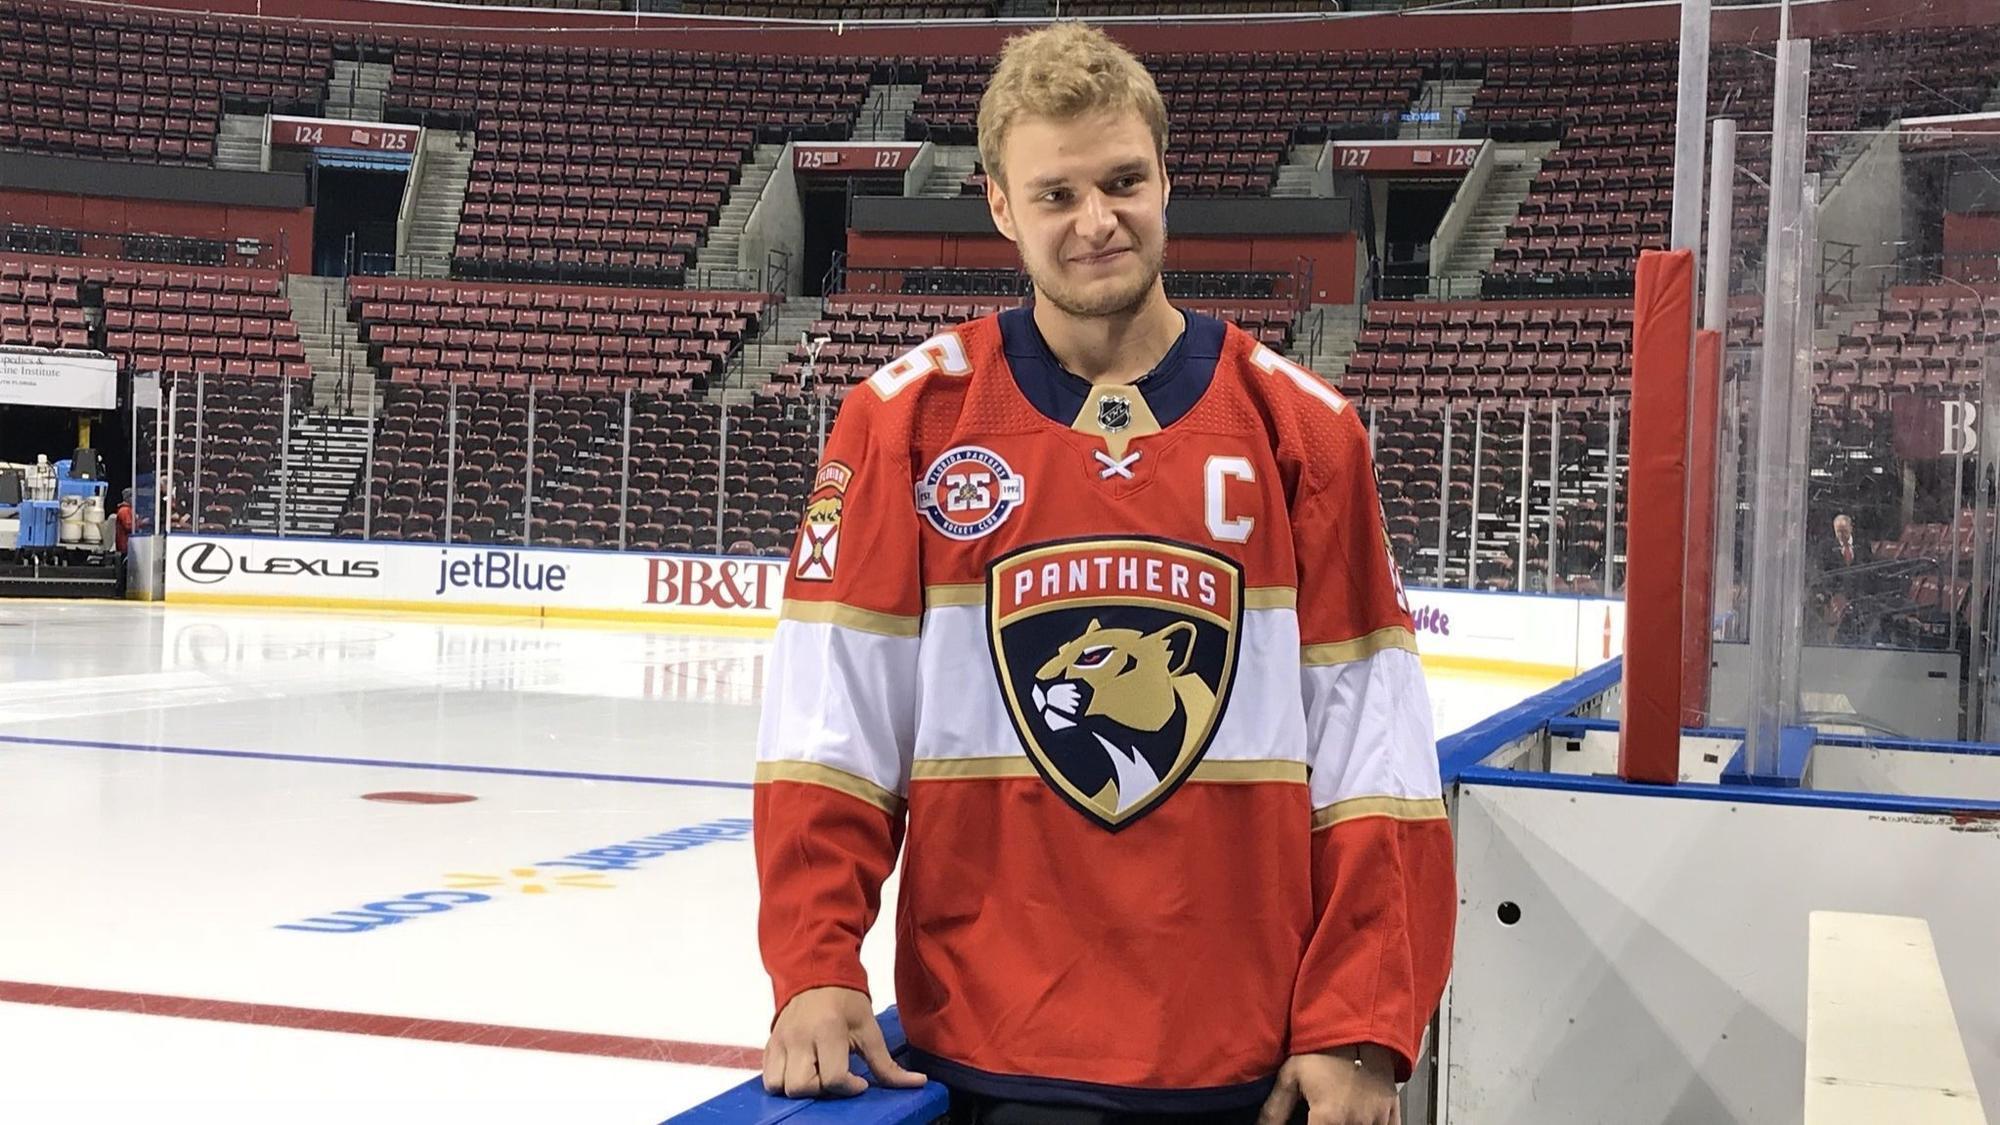 Aleksander Barkov Florida Panthers Player Swingman Jersey